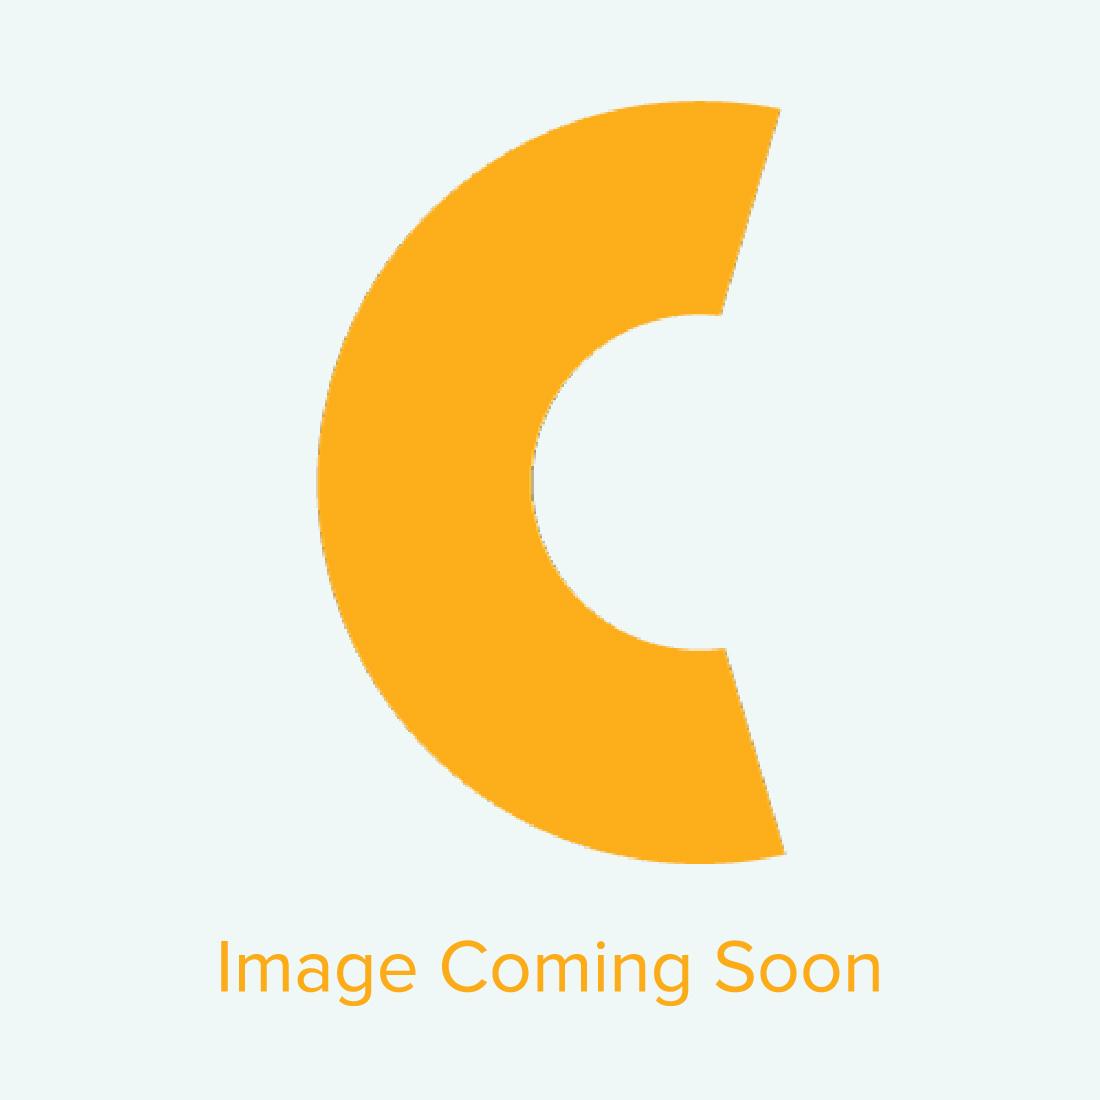 Epson 1400/1430- Sublijet IQ Ink - Standard Capacity - Magenta - CLEARANCE